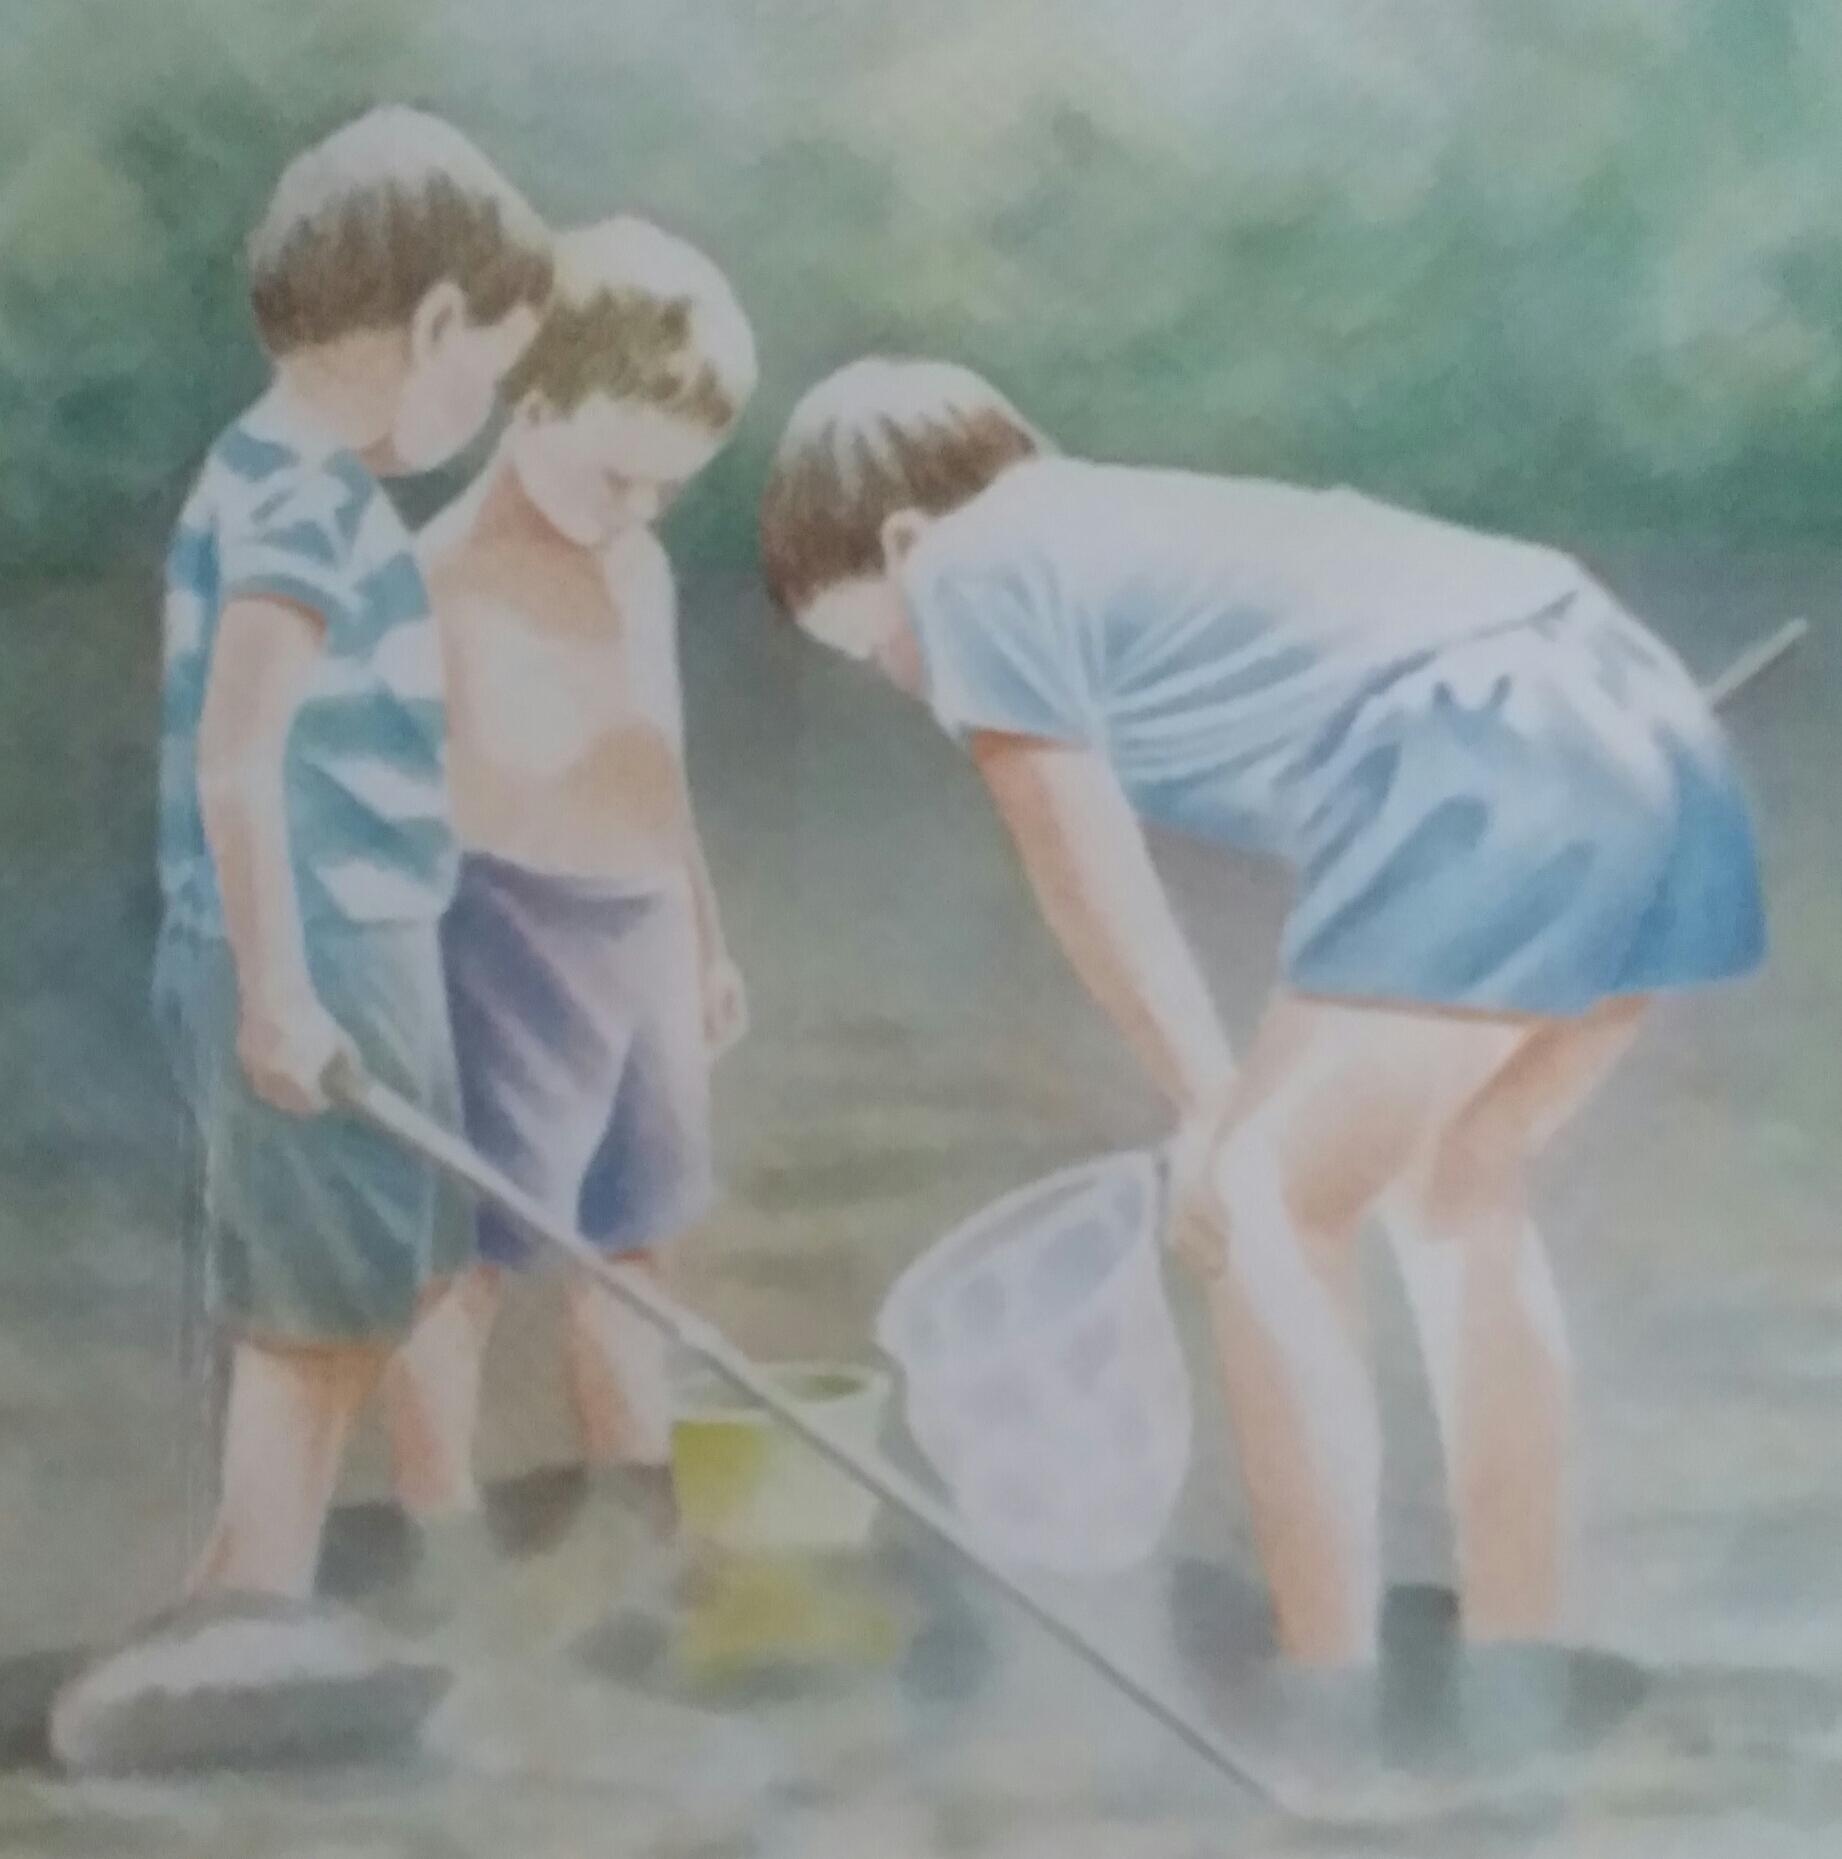 BOYS GONE FISHIN